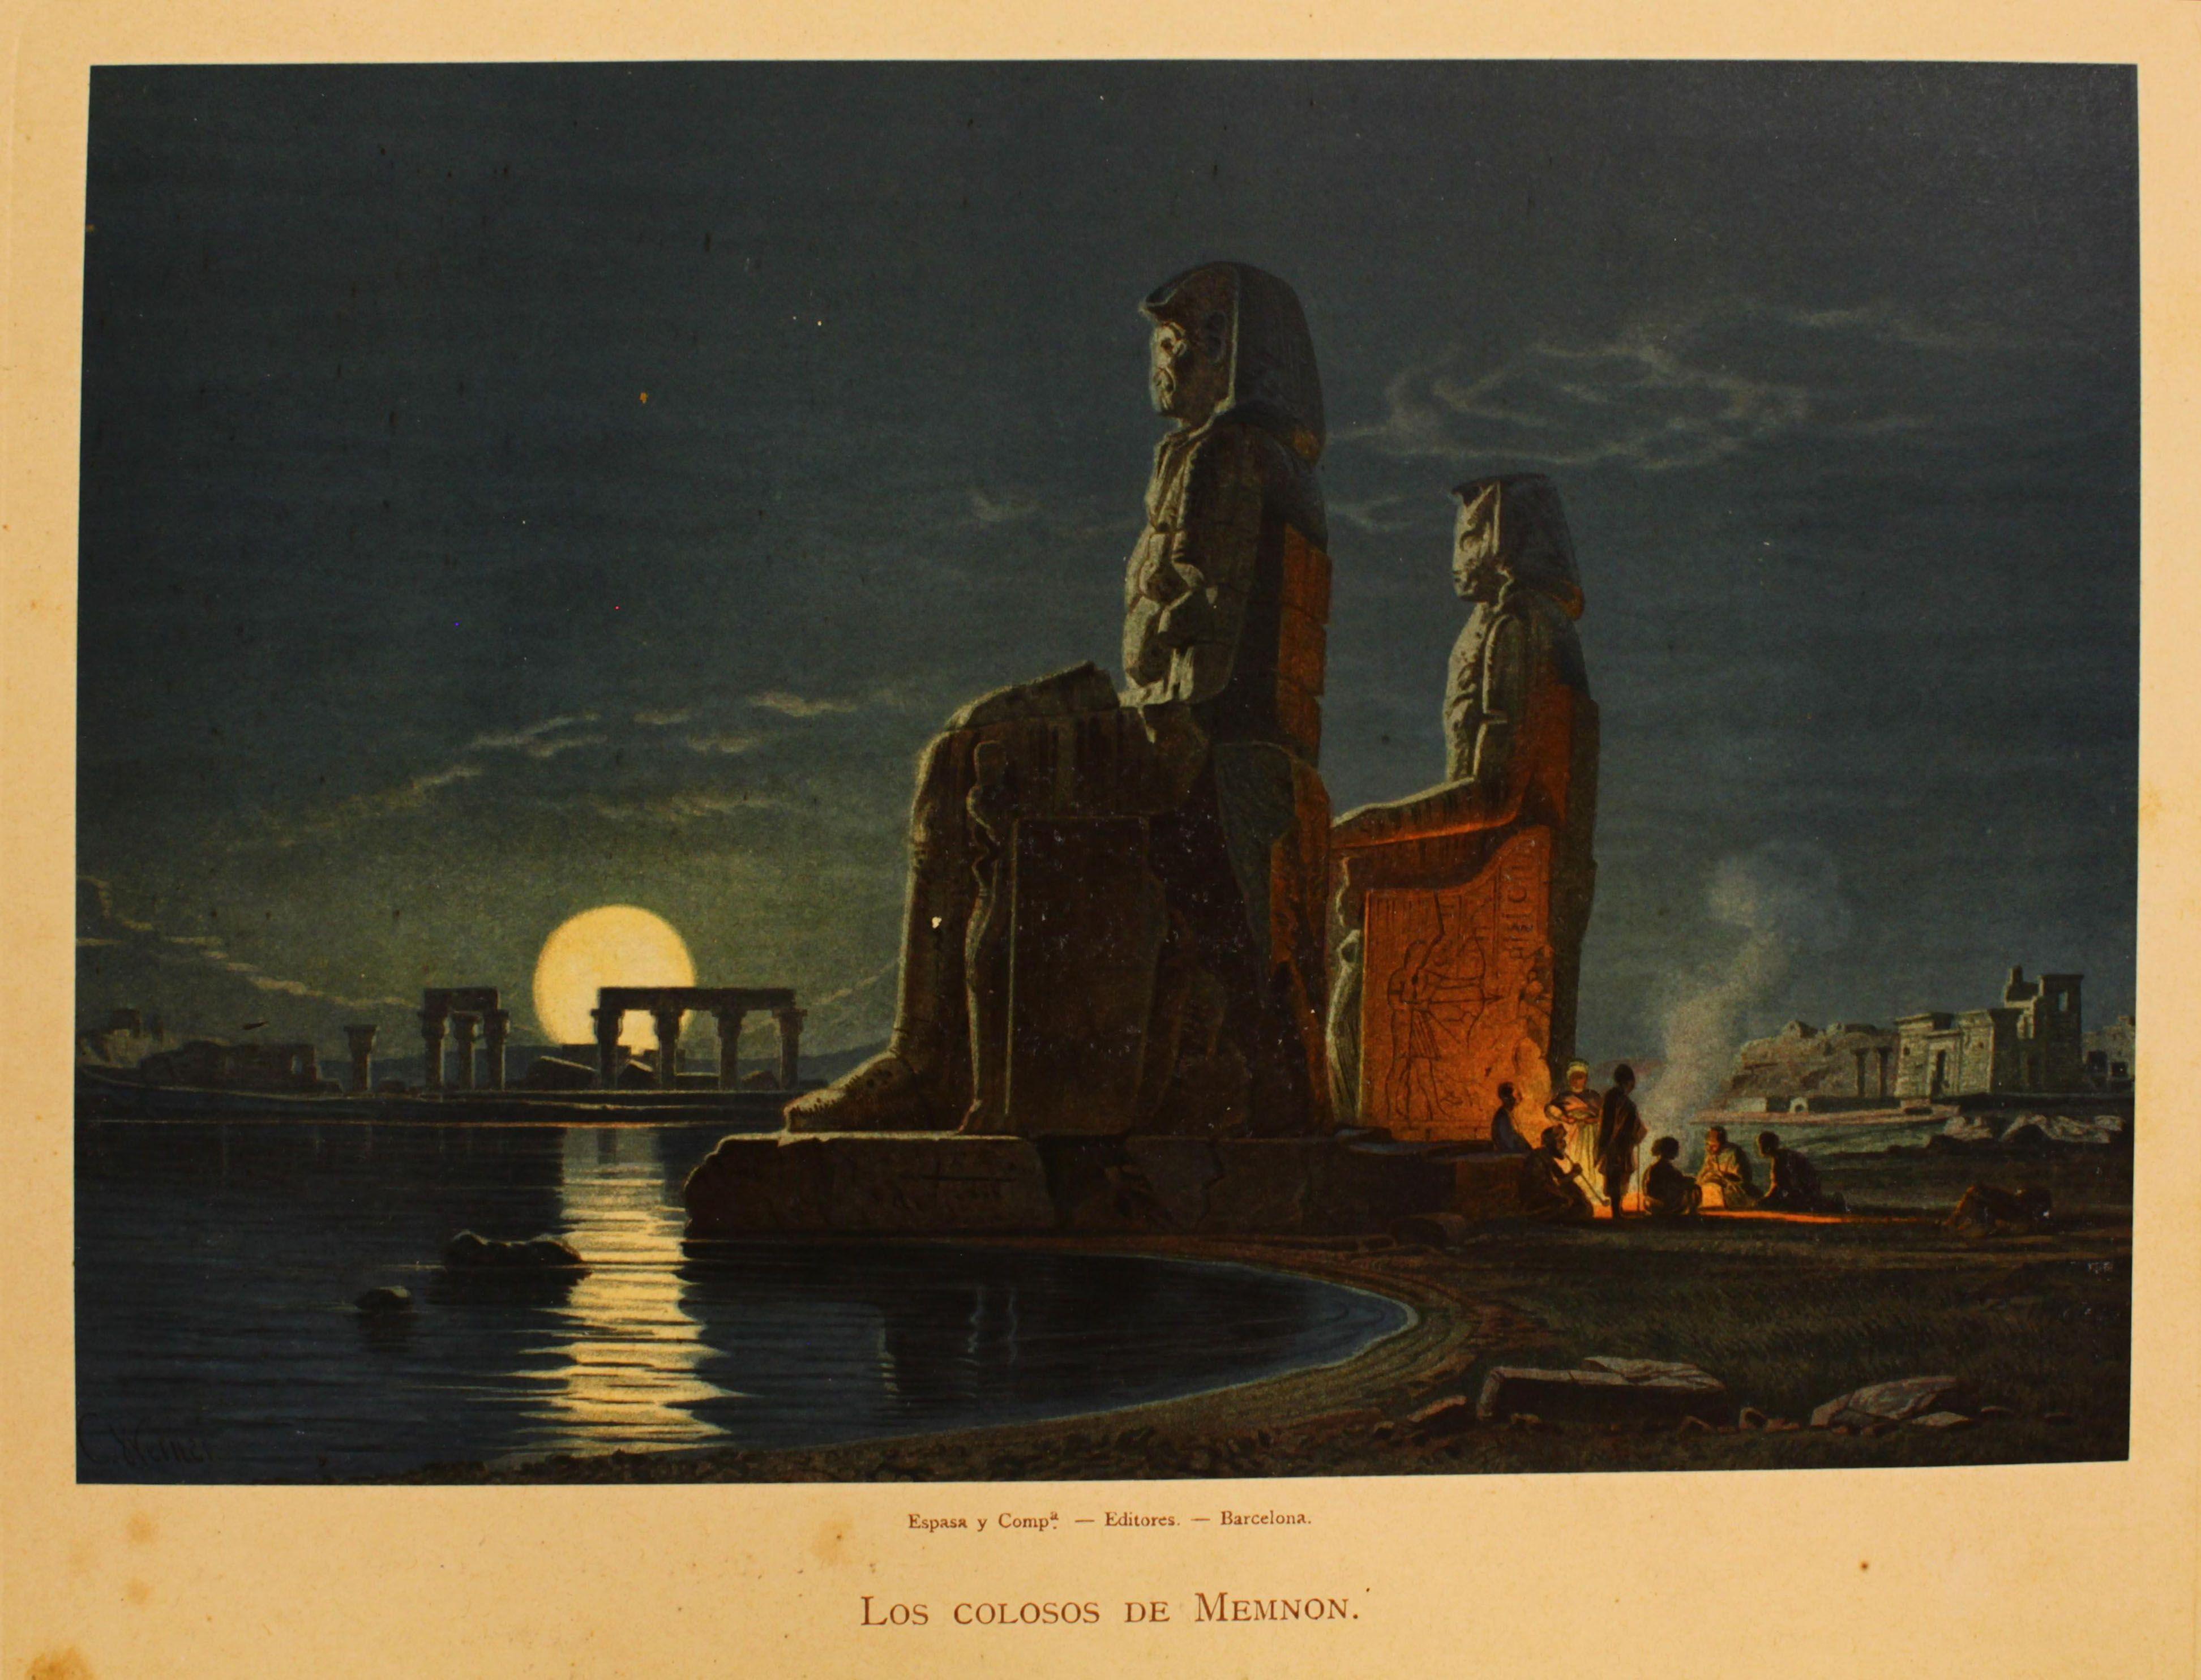 Resultado de imagen de egipto wikimedia commons